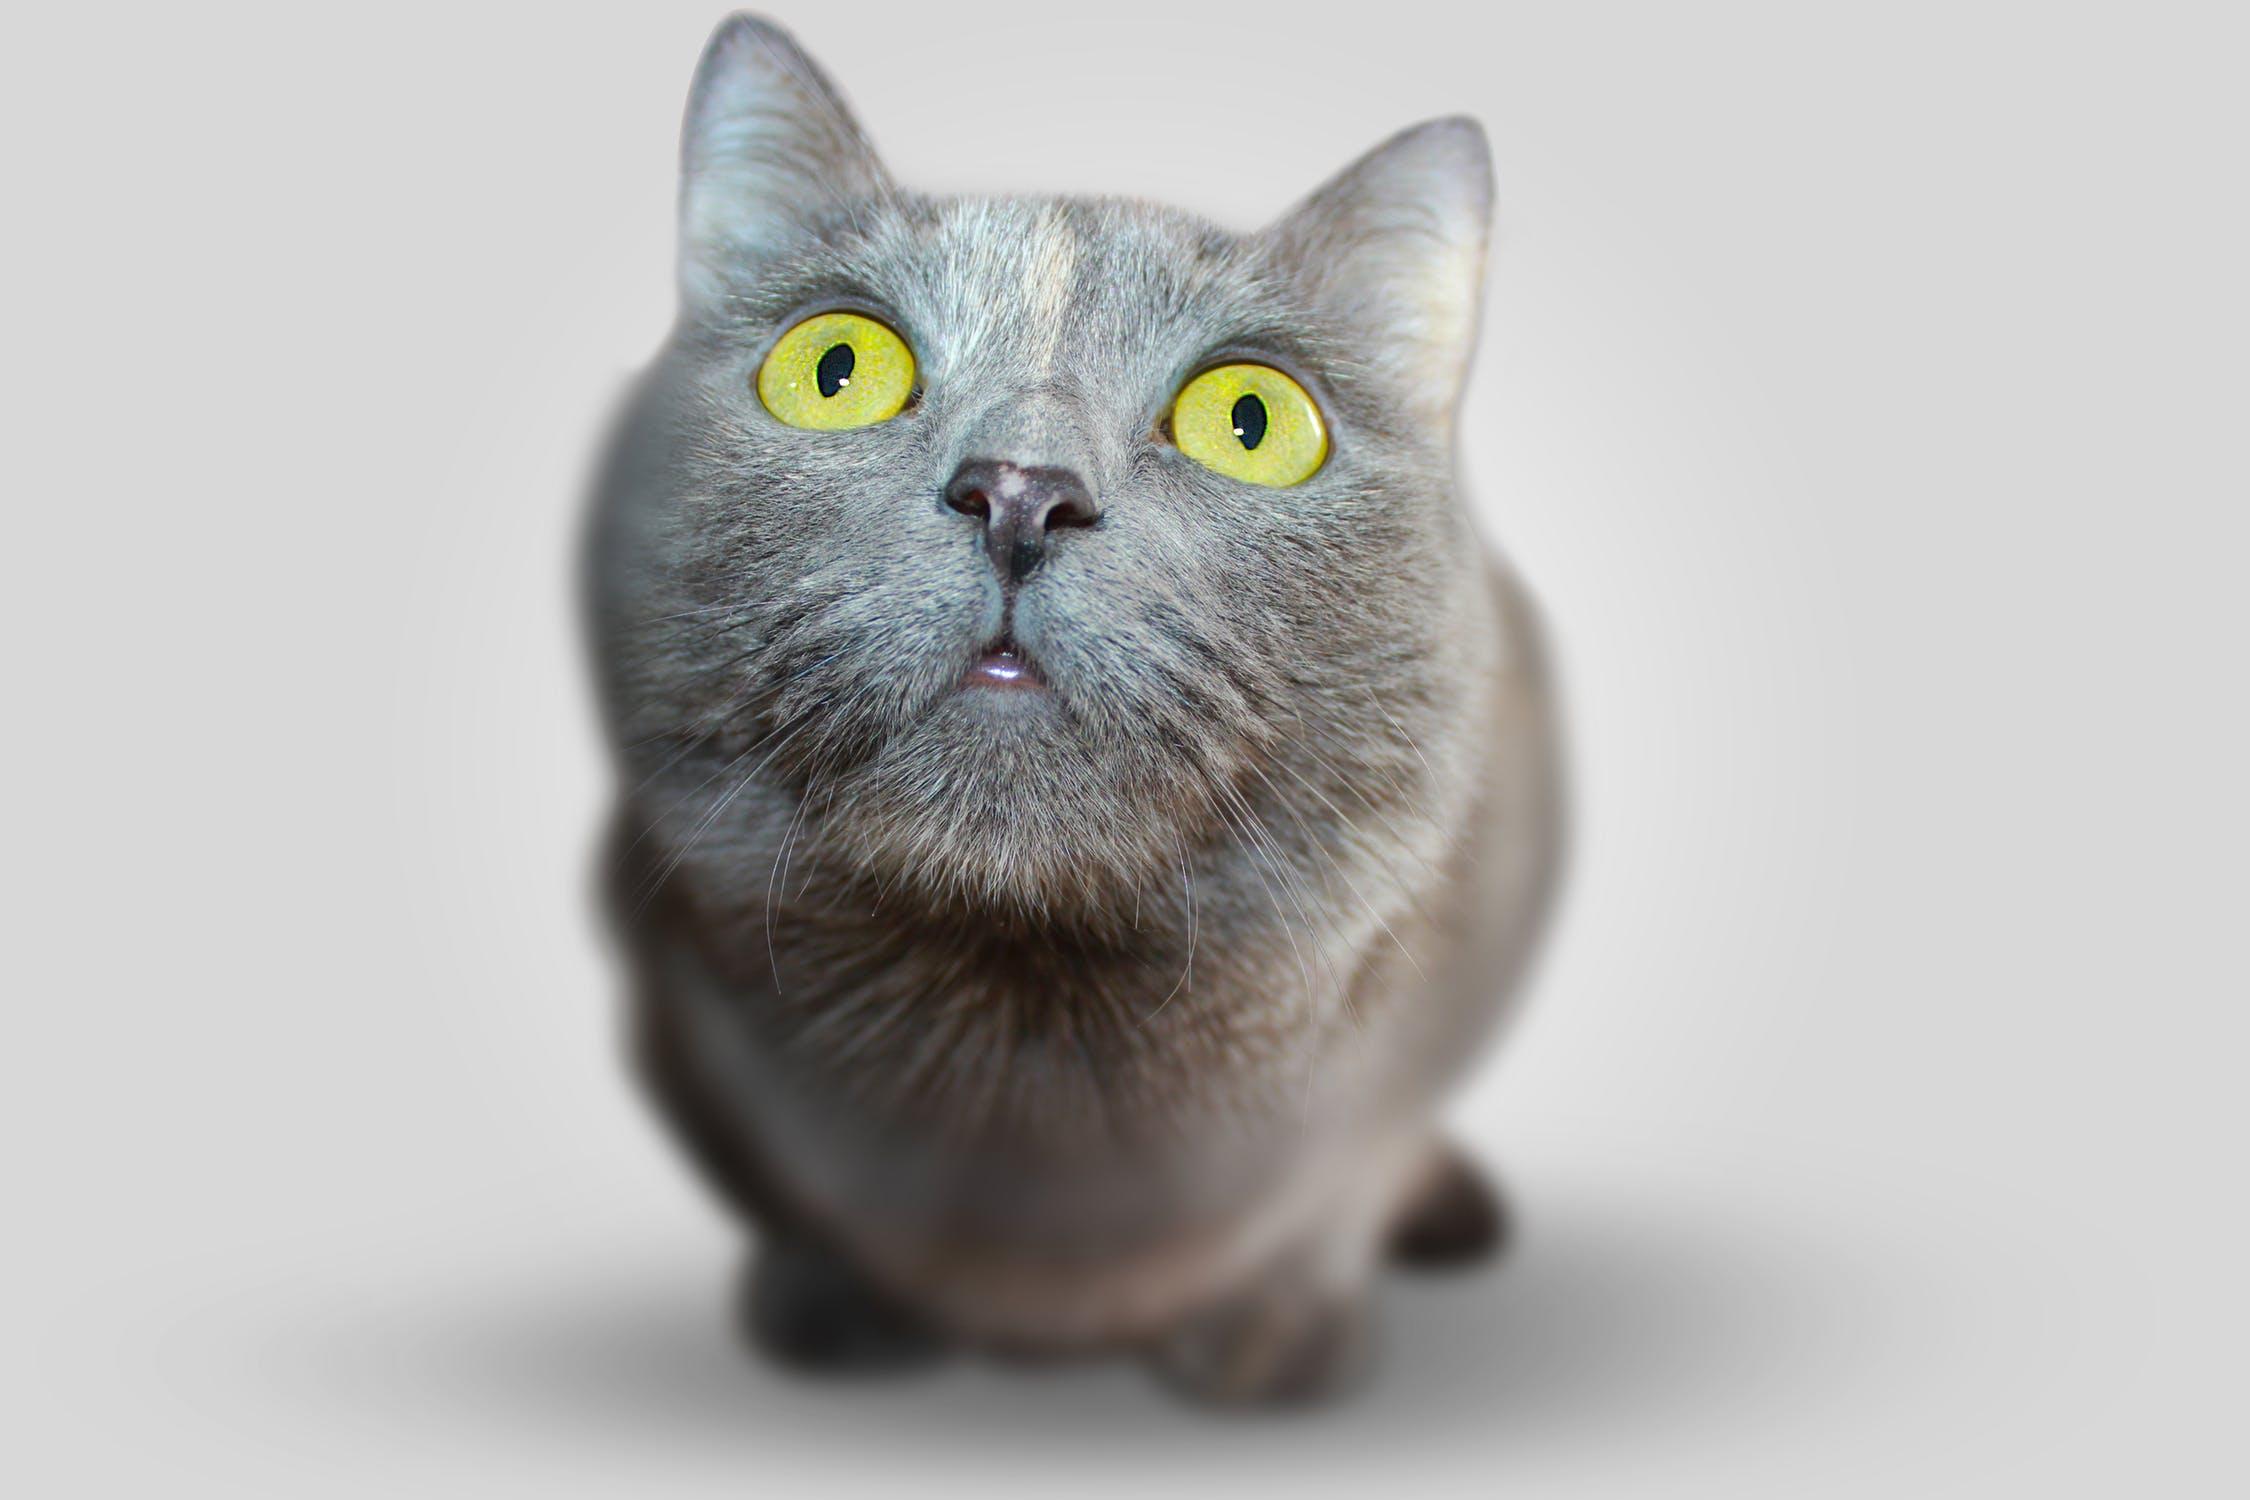 small animal ophthalmology whats your diagnosis